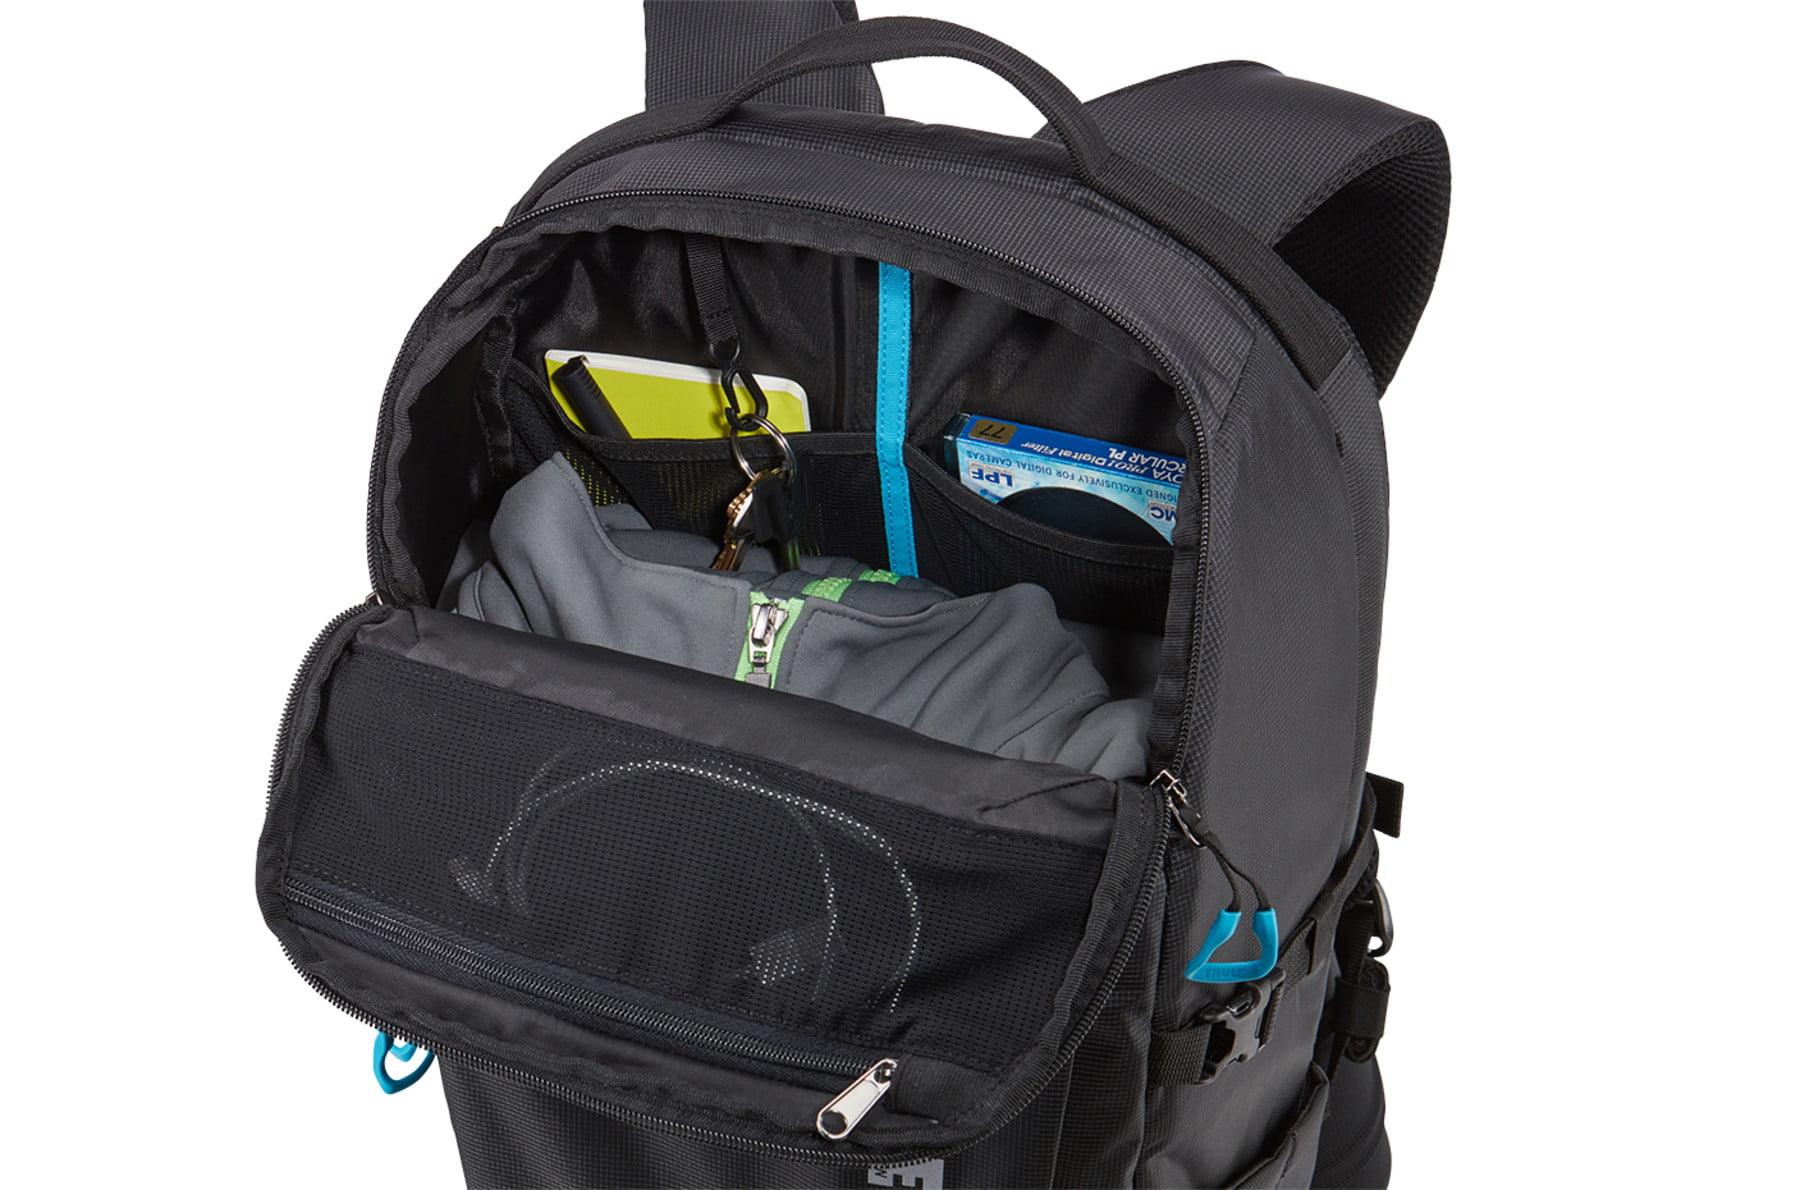 Rucsac foto Thule Aspect DSLR Backpack Negru 6